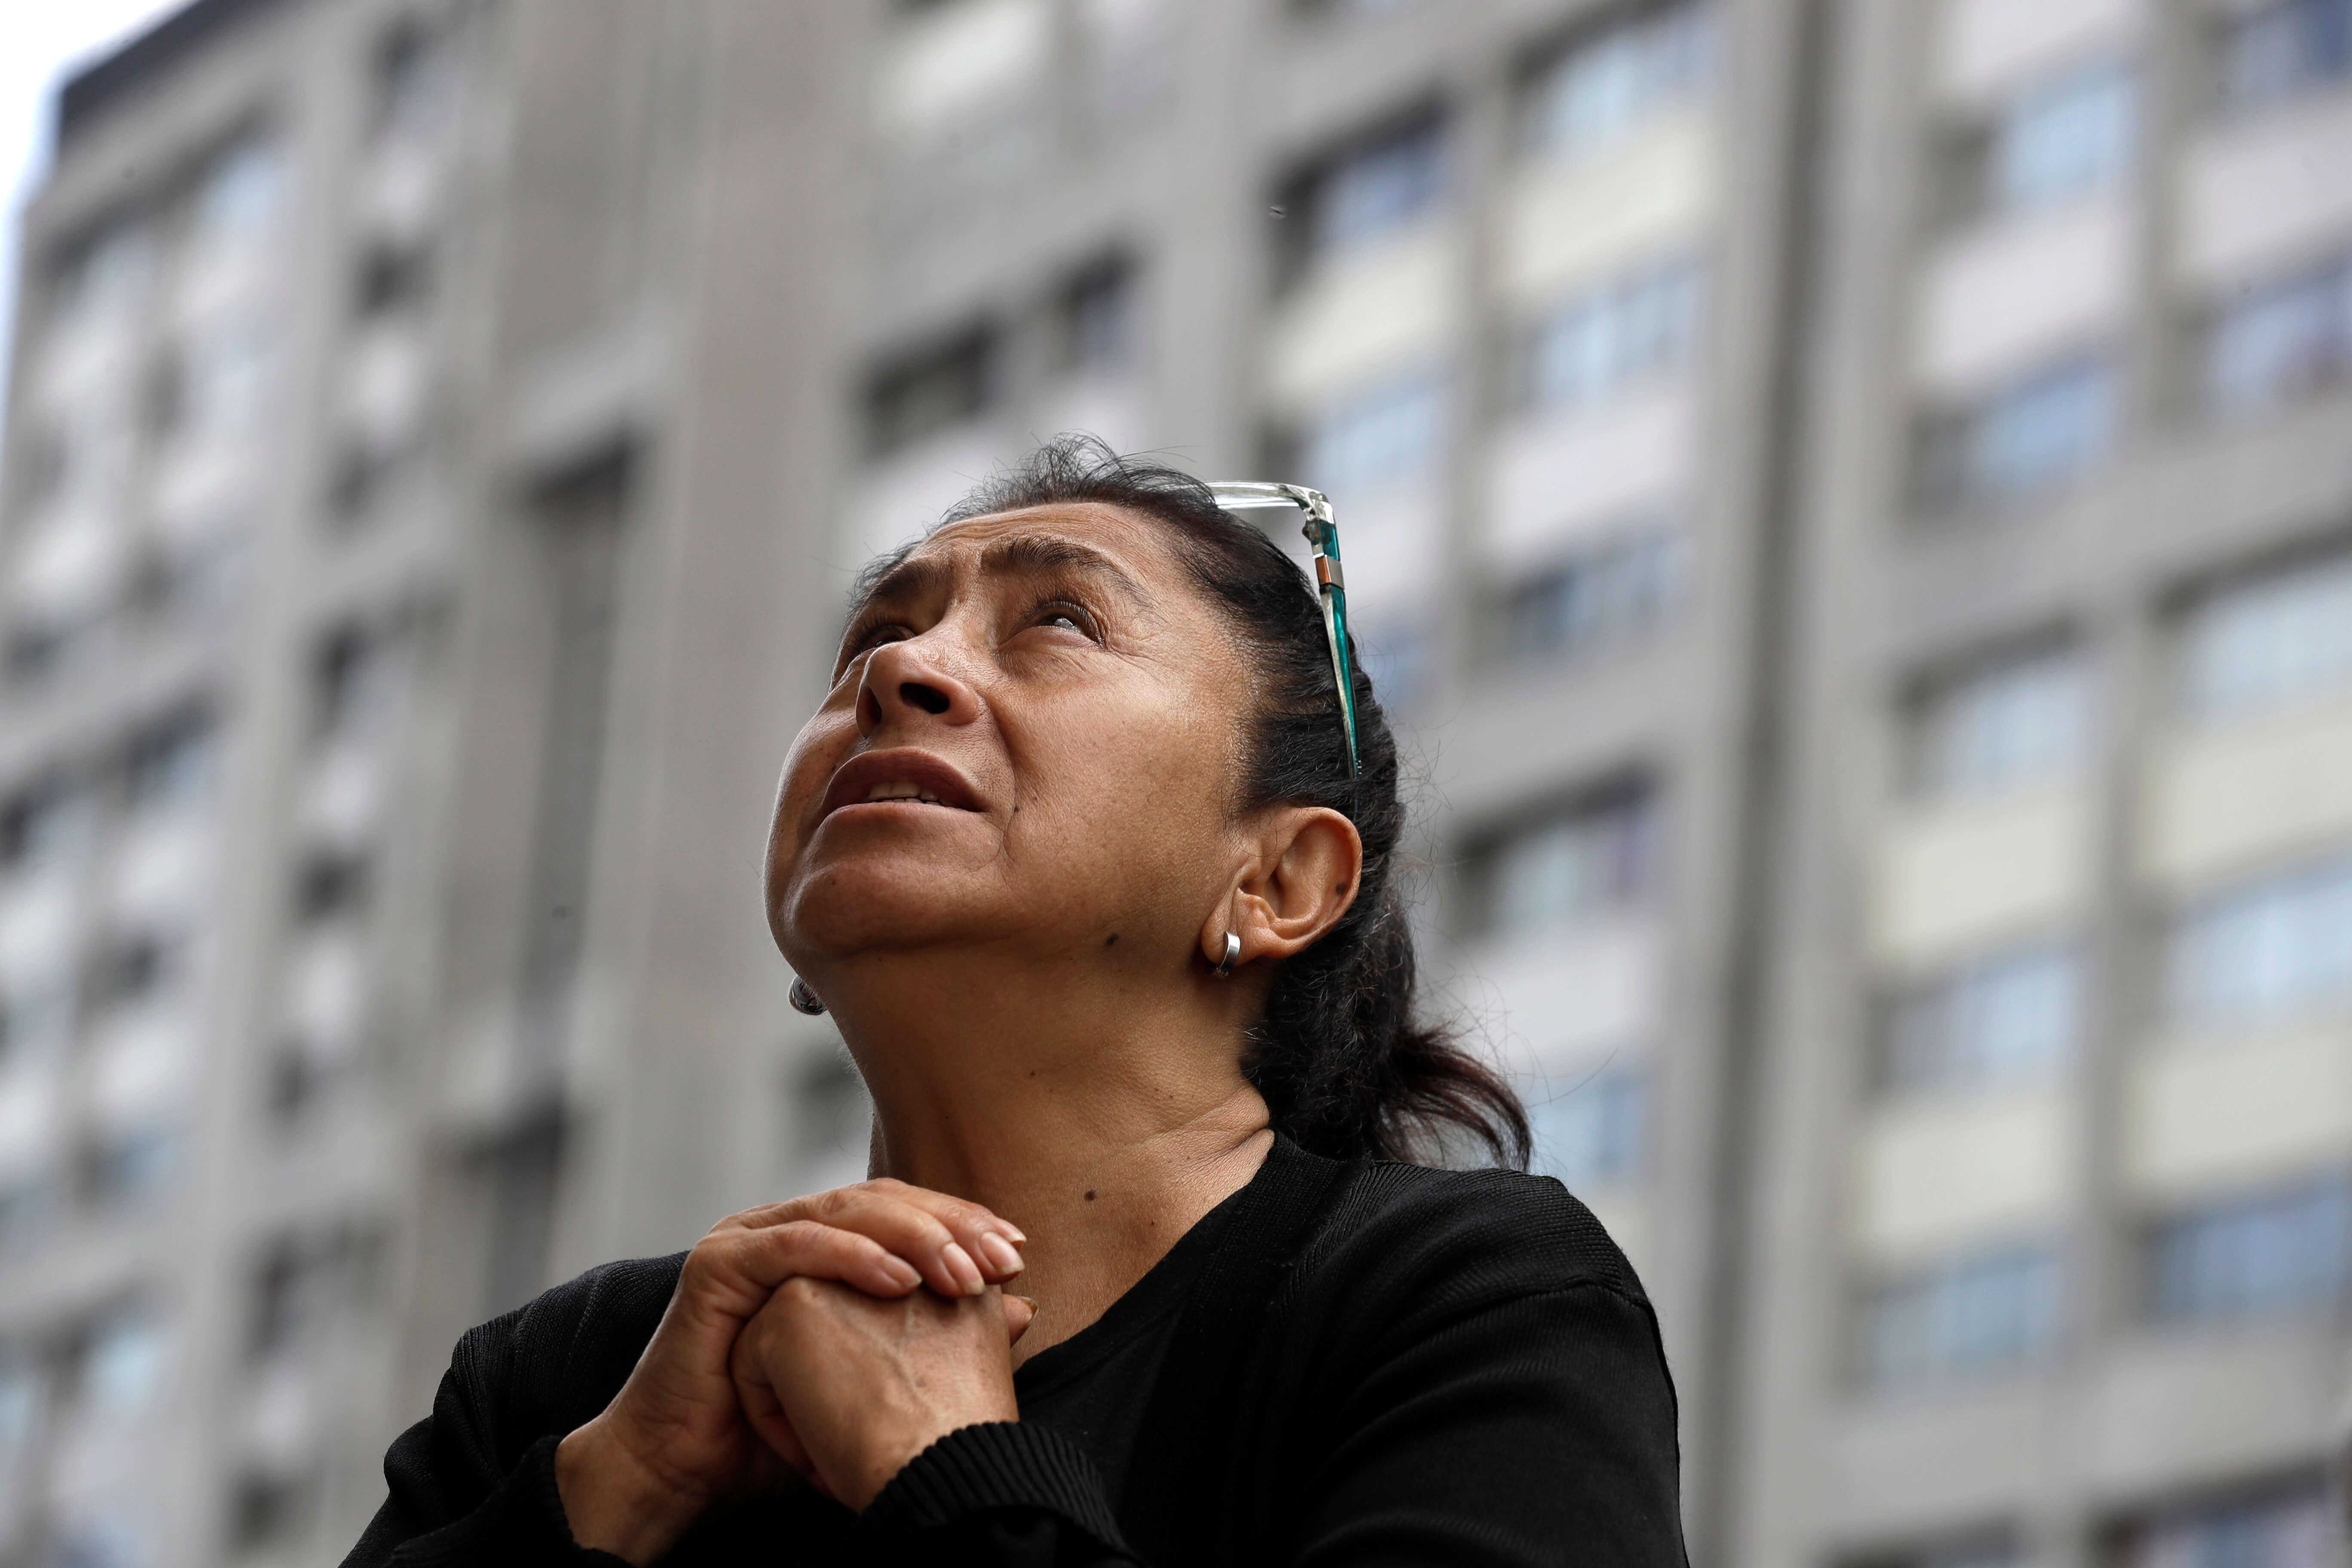 Investigarán efecto del sismo 19S sobre ADN de mexicanos